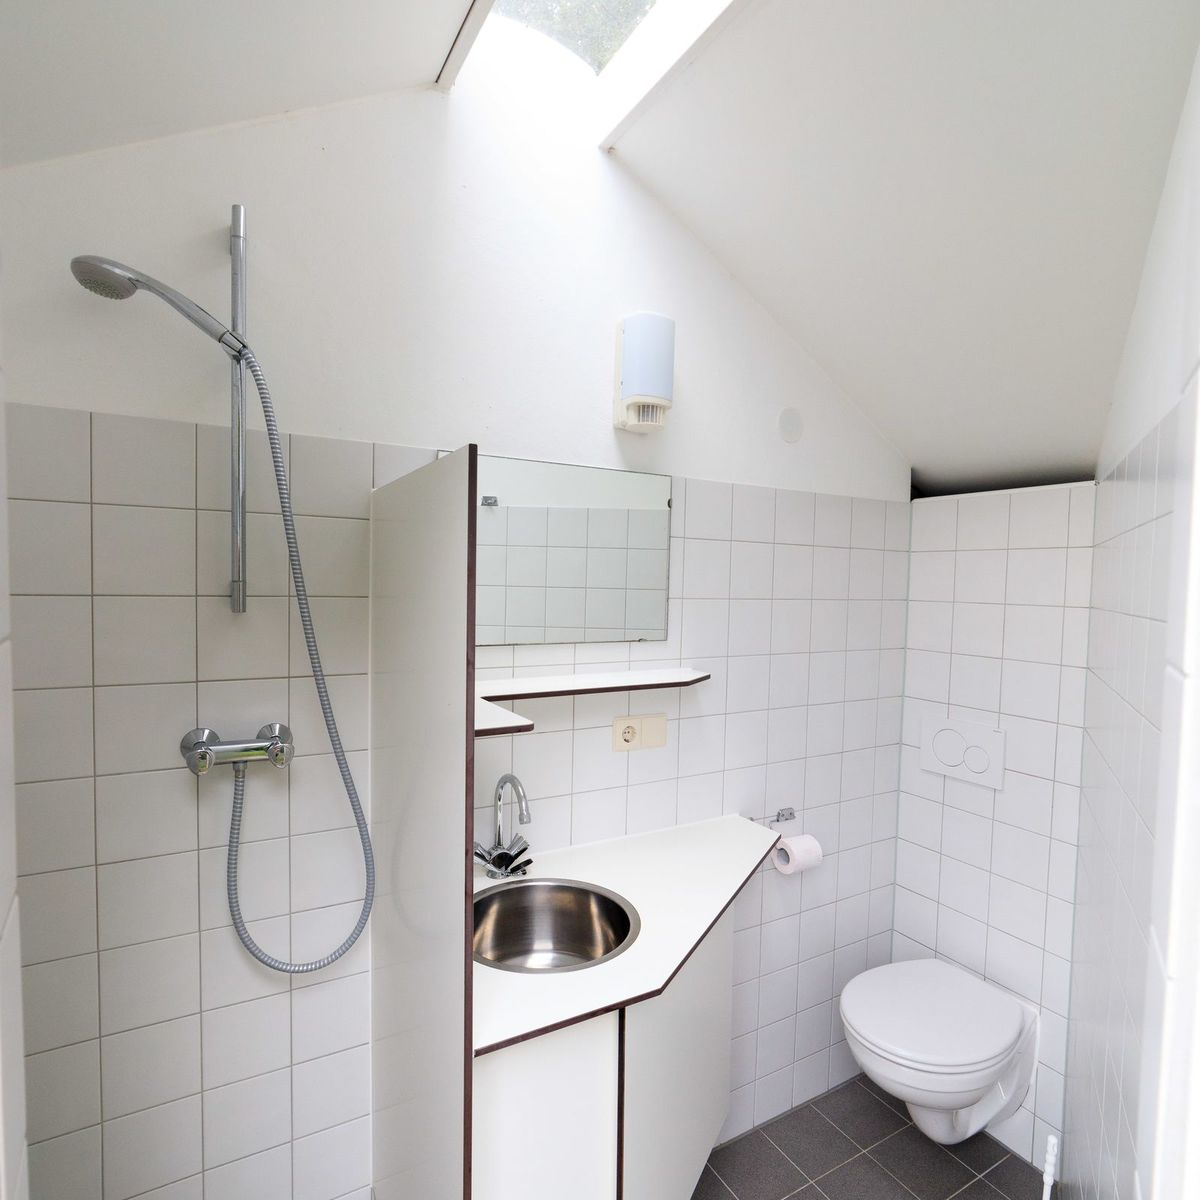 Privé sanitair comfortplaats